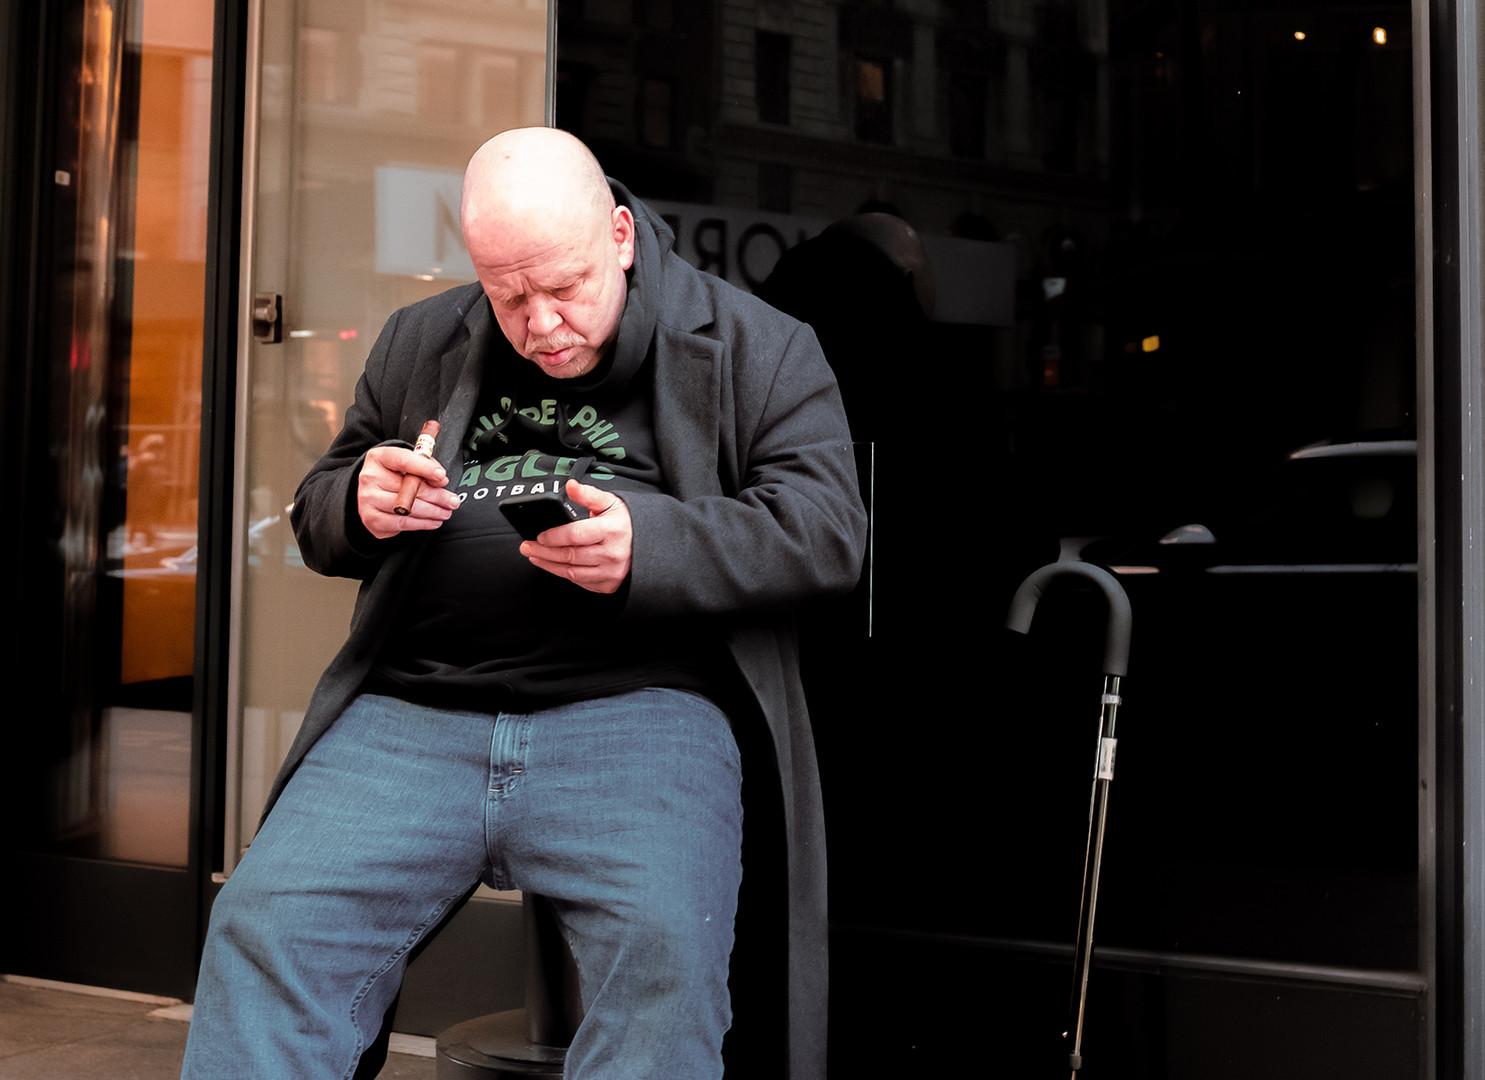 Man with cigar.jpg